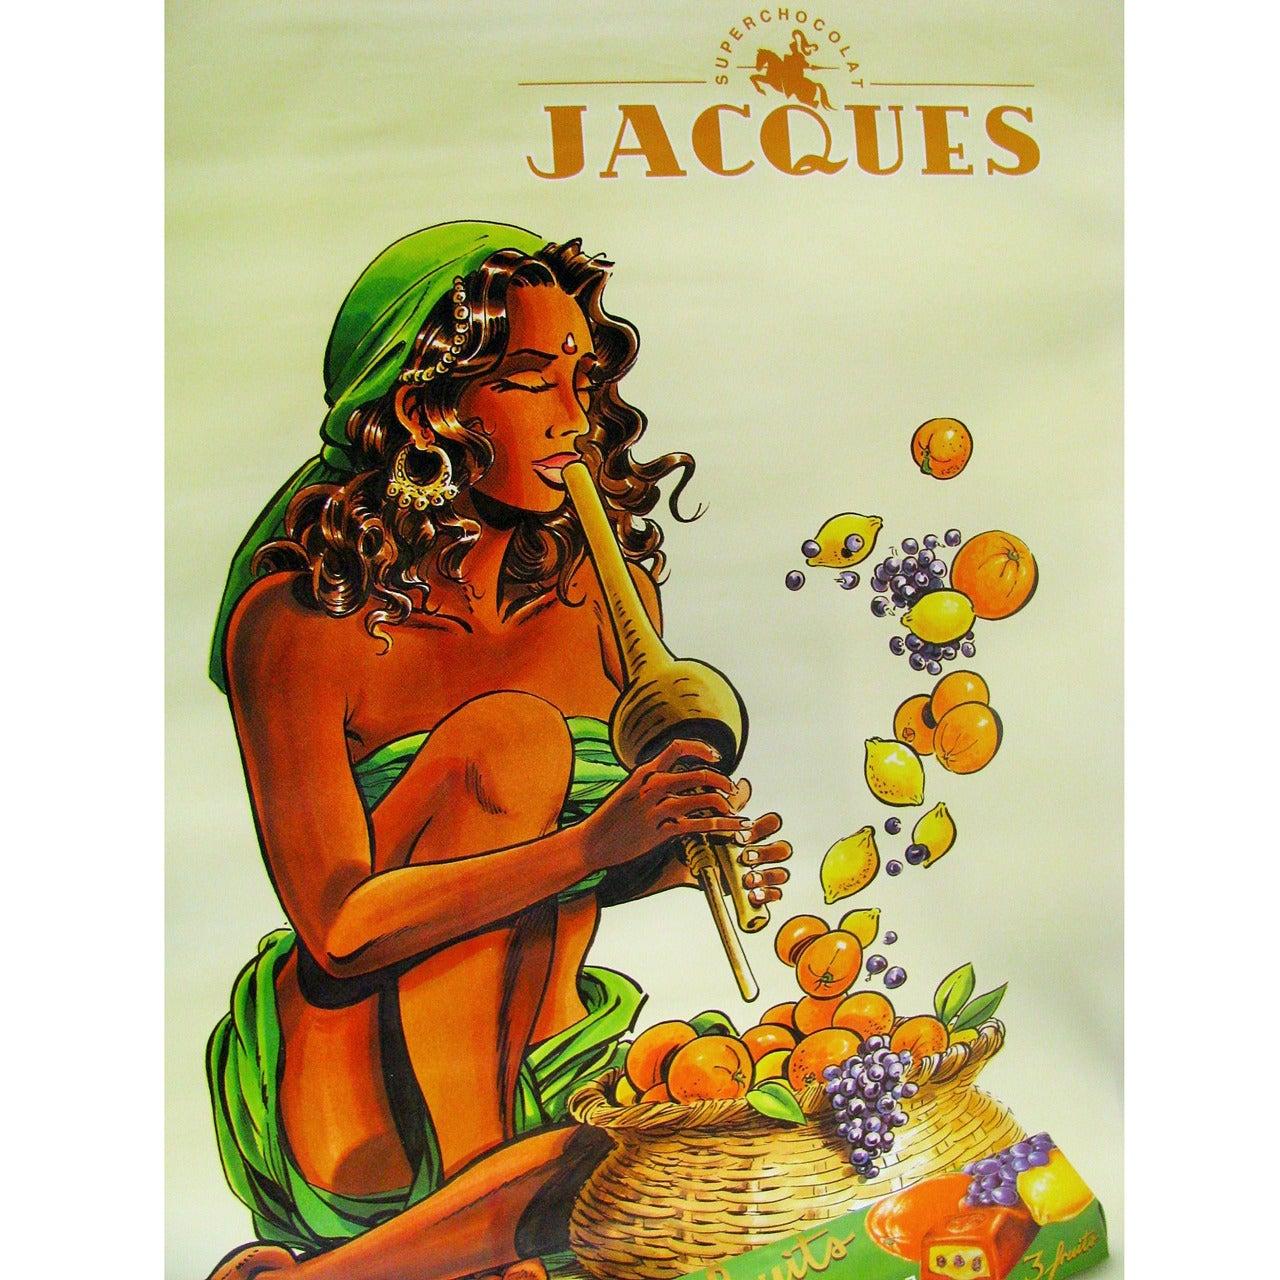 Oversized Chocolate Advertising Poster, Belgium, 1999